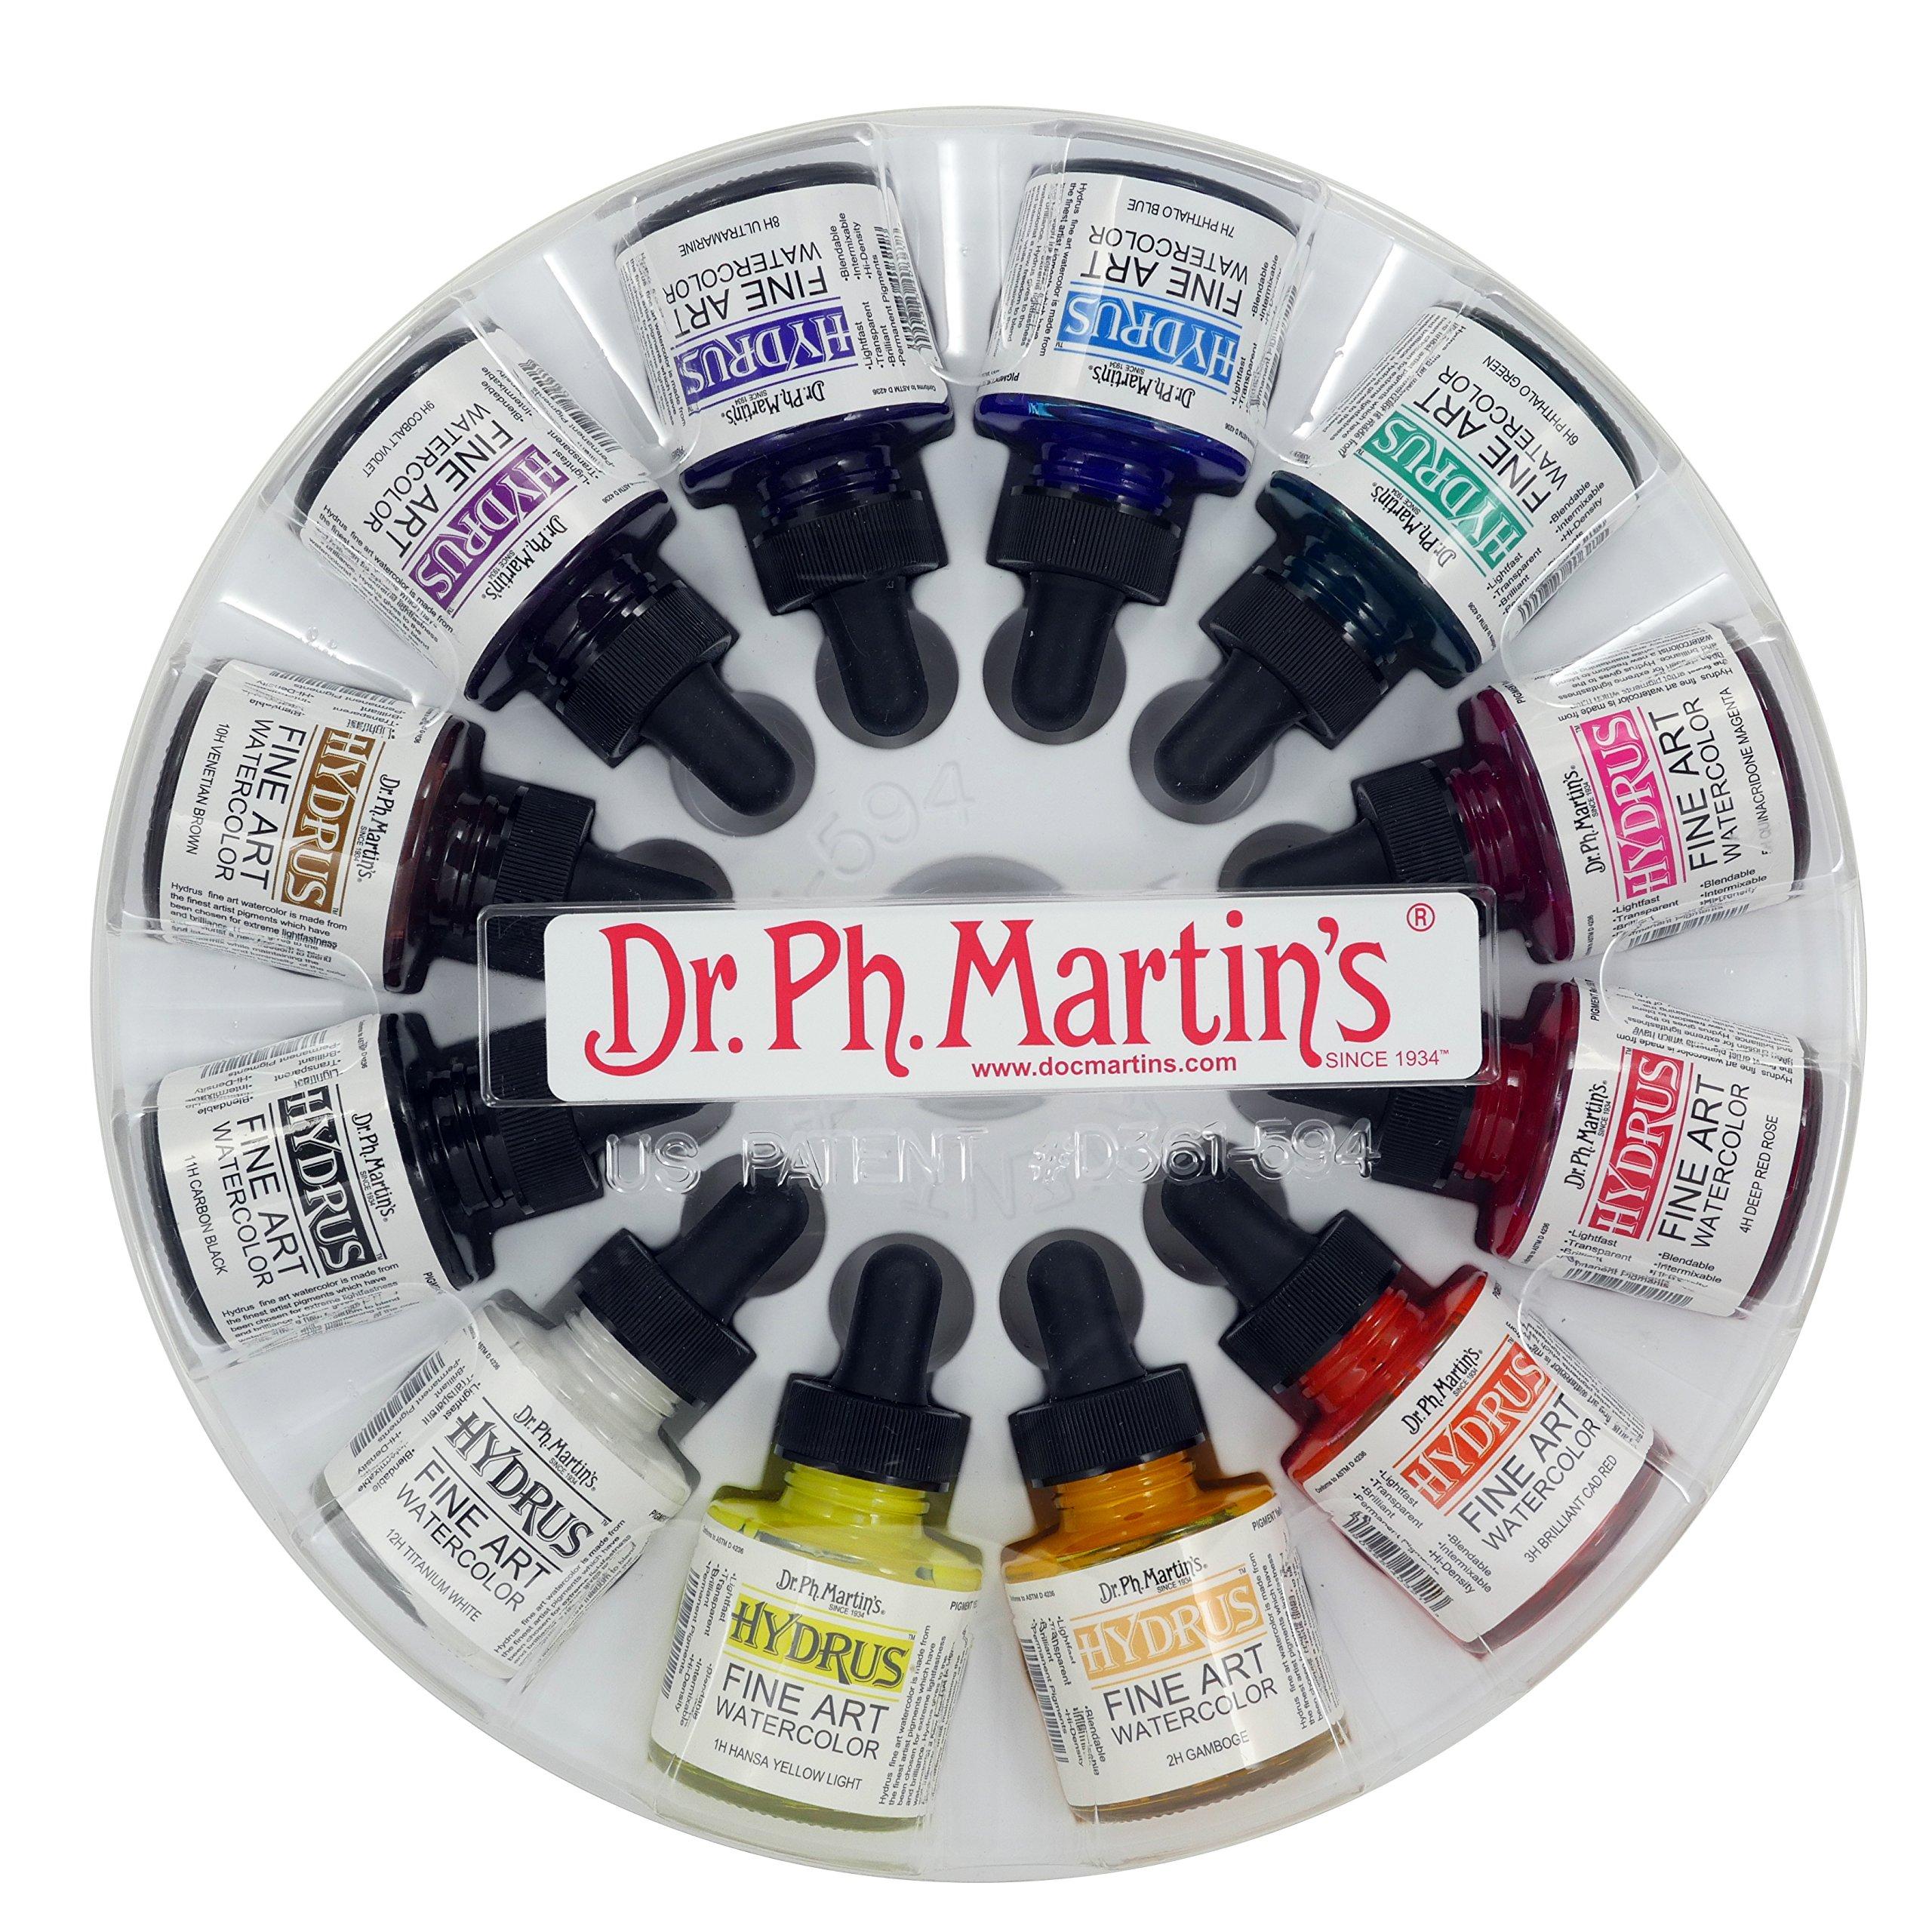 Dr. Ph. Martin's 400255-XXX Hydrus Fine Art Watercolor Bottles, 1.0 oz, Set of 12 (Set 1) by Dr. Ph. Martin's